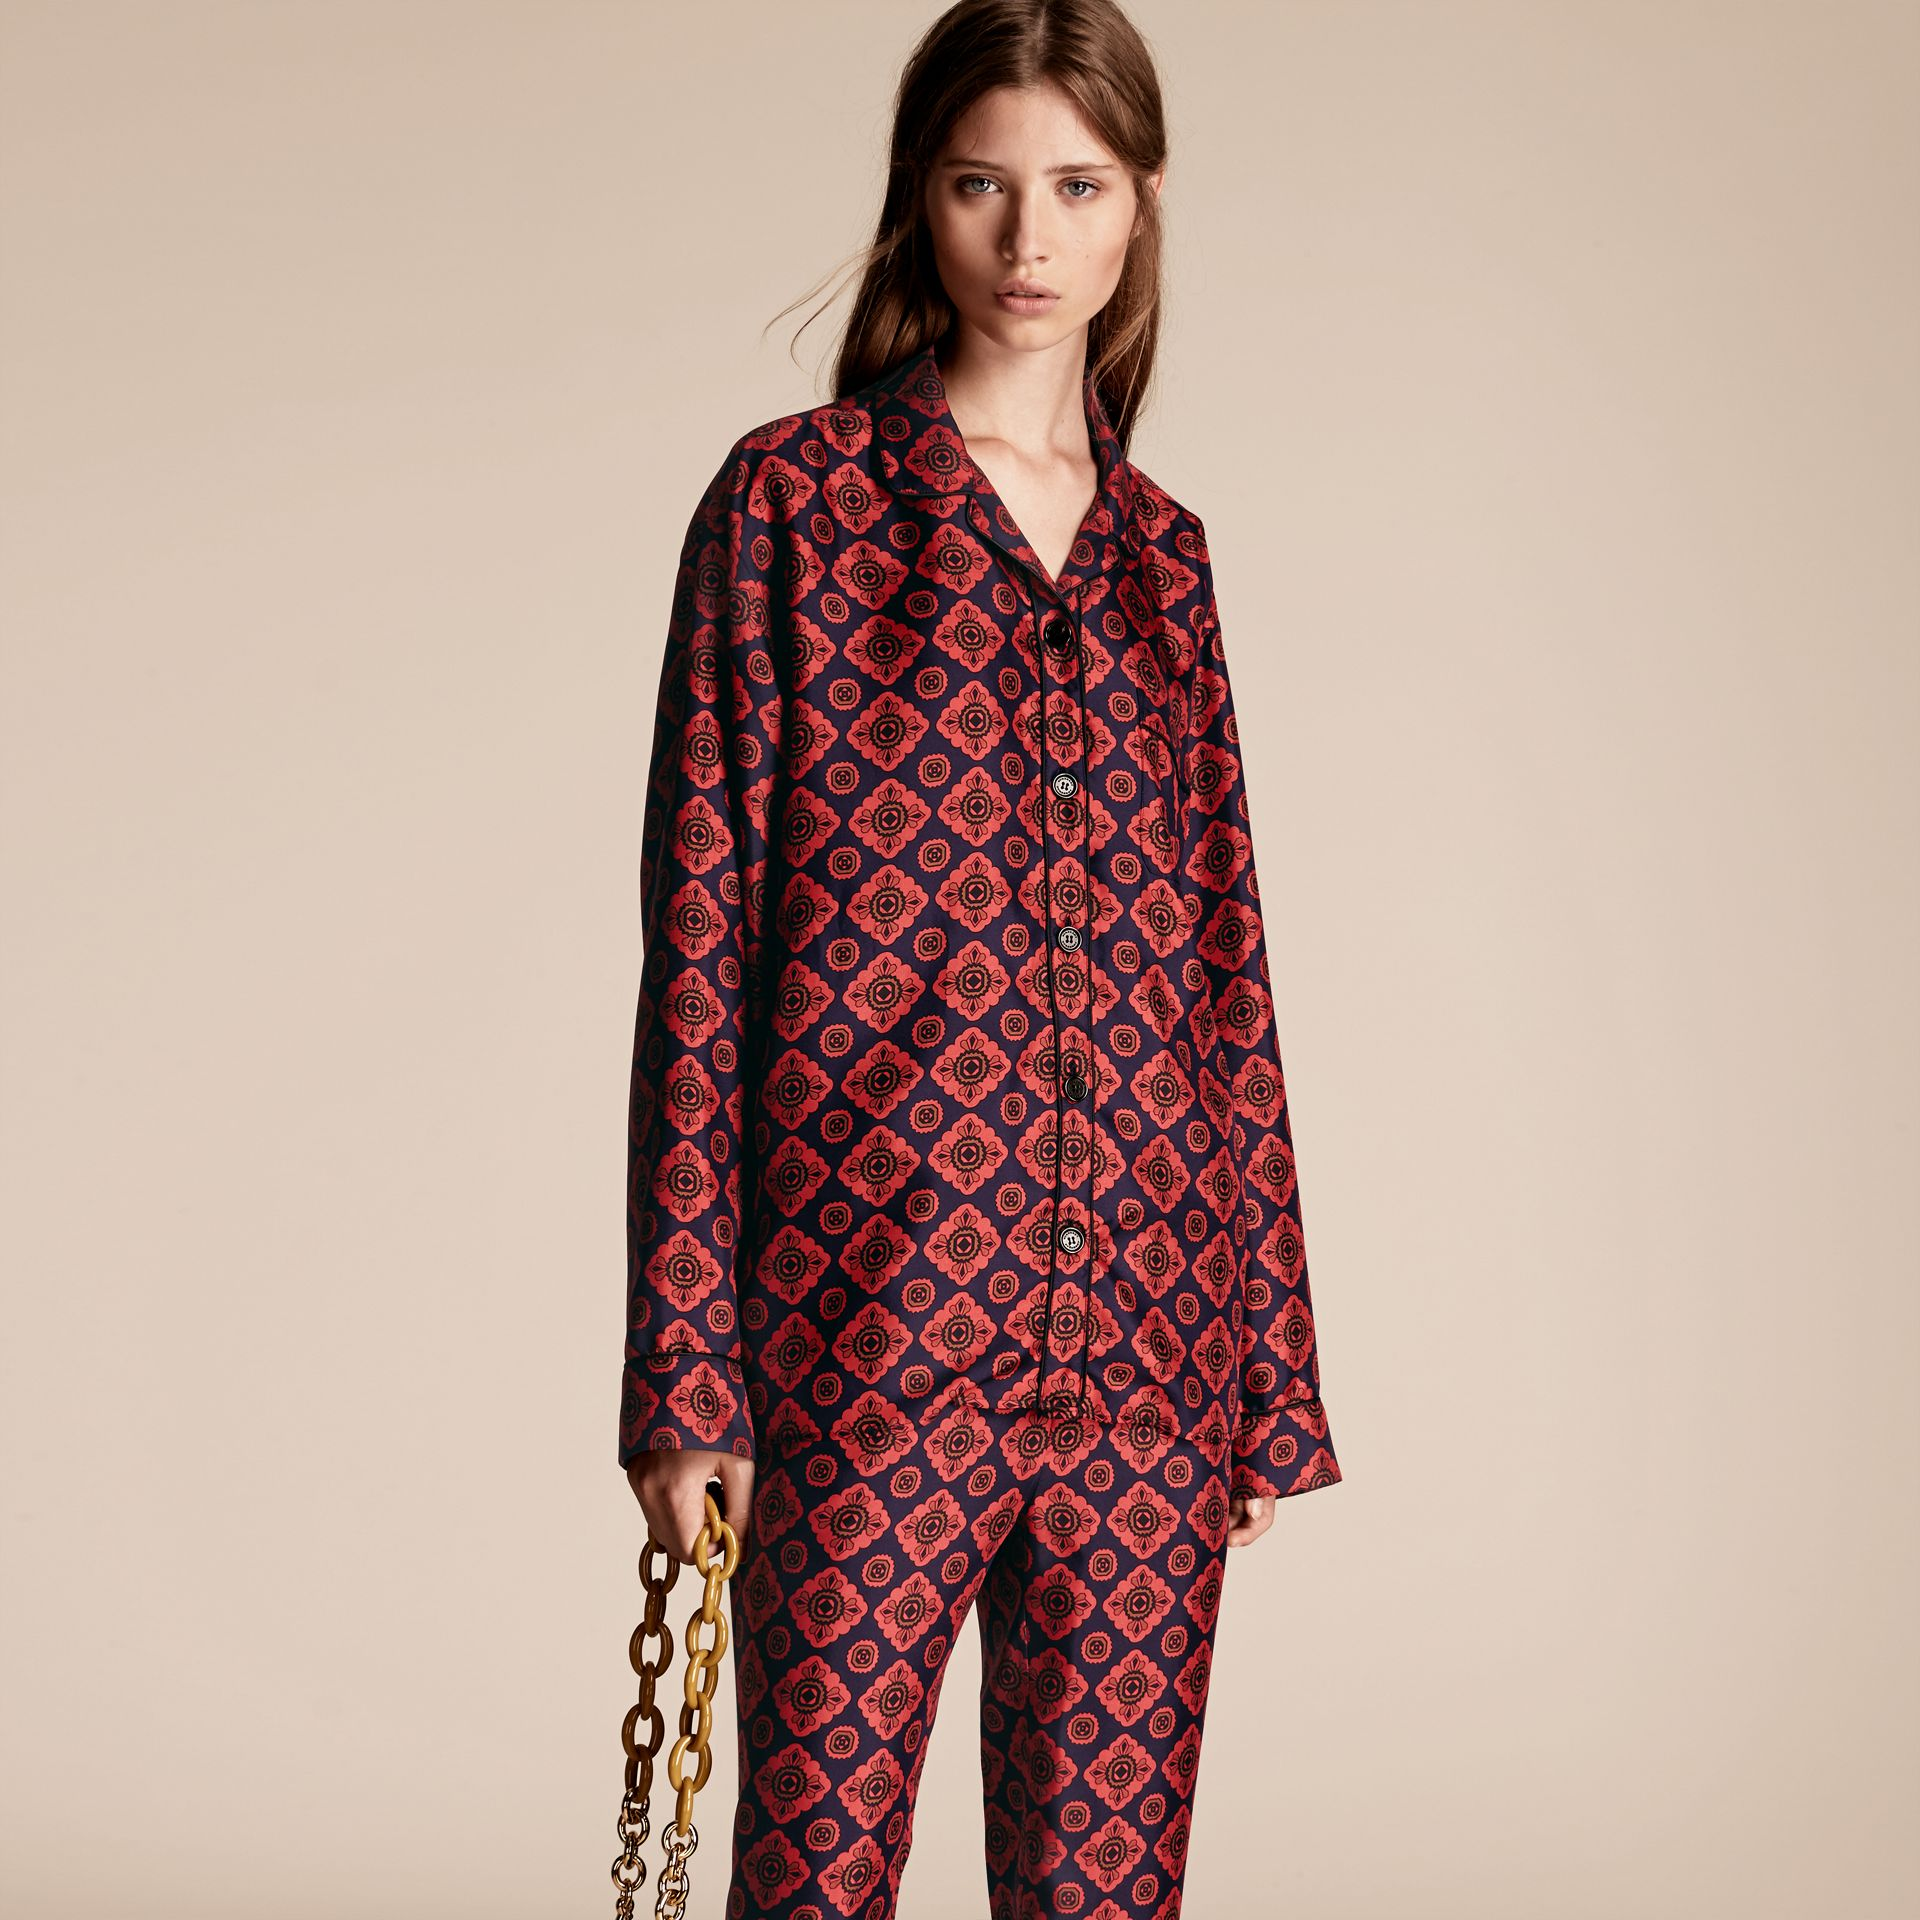 Seidenbluse im Pyjamastil mit geometrischem Kachelmuster - Galerie-Bild 1